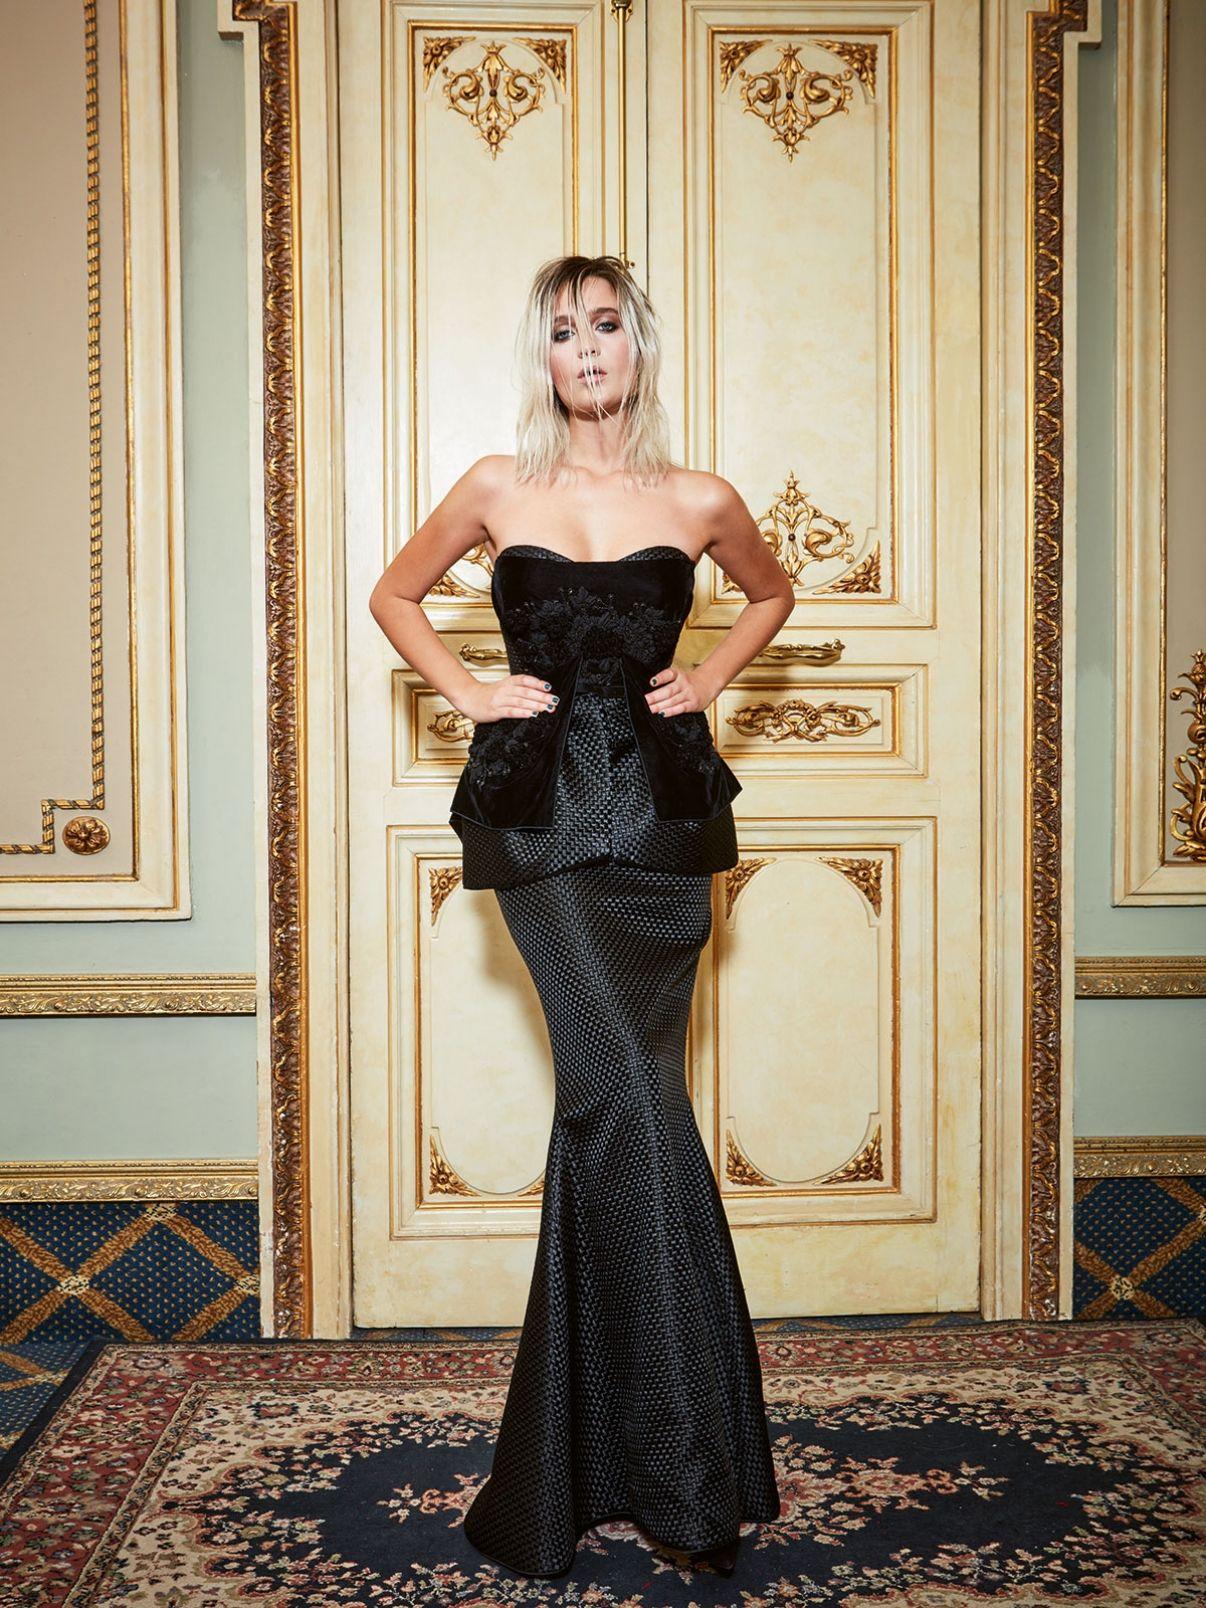 YolanCris | New Couture Collection FW 2016/2017   #YolanCris #Couture  #redcarpet #redcarpetlook #trends #newtrends #fashion #Straplessdress #Couturefabrics #blackdress